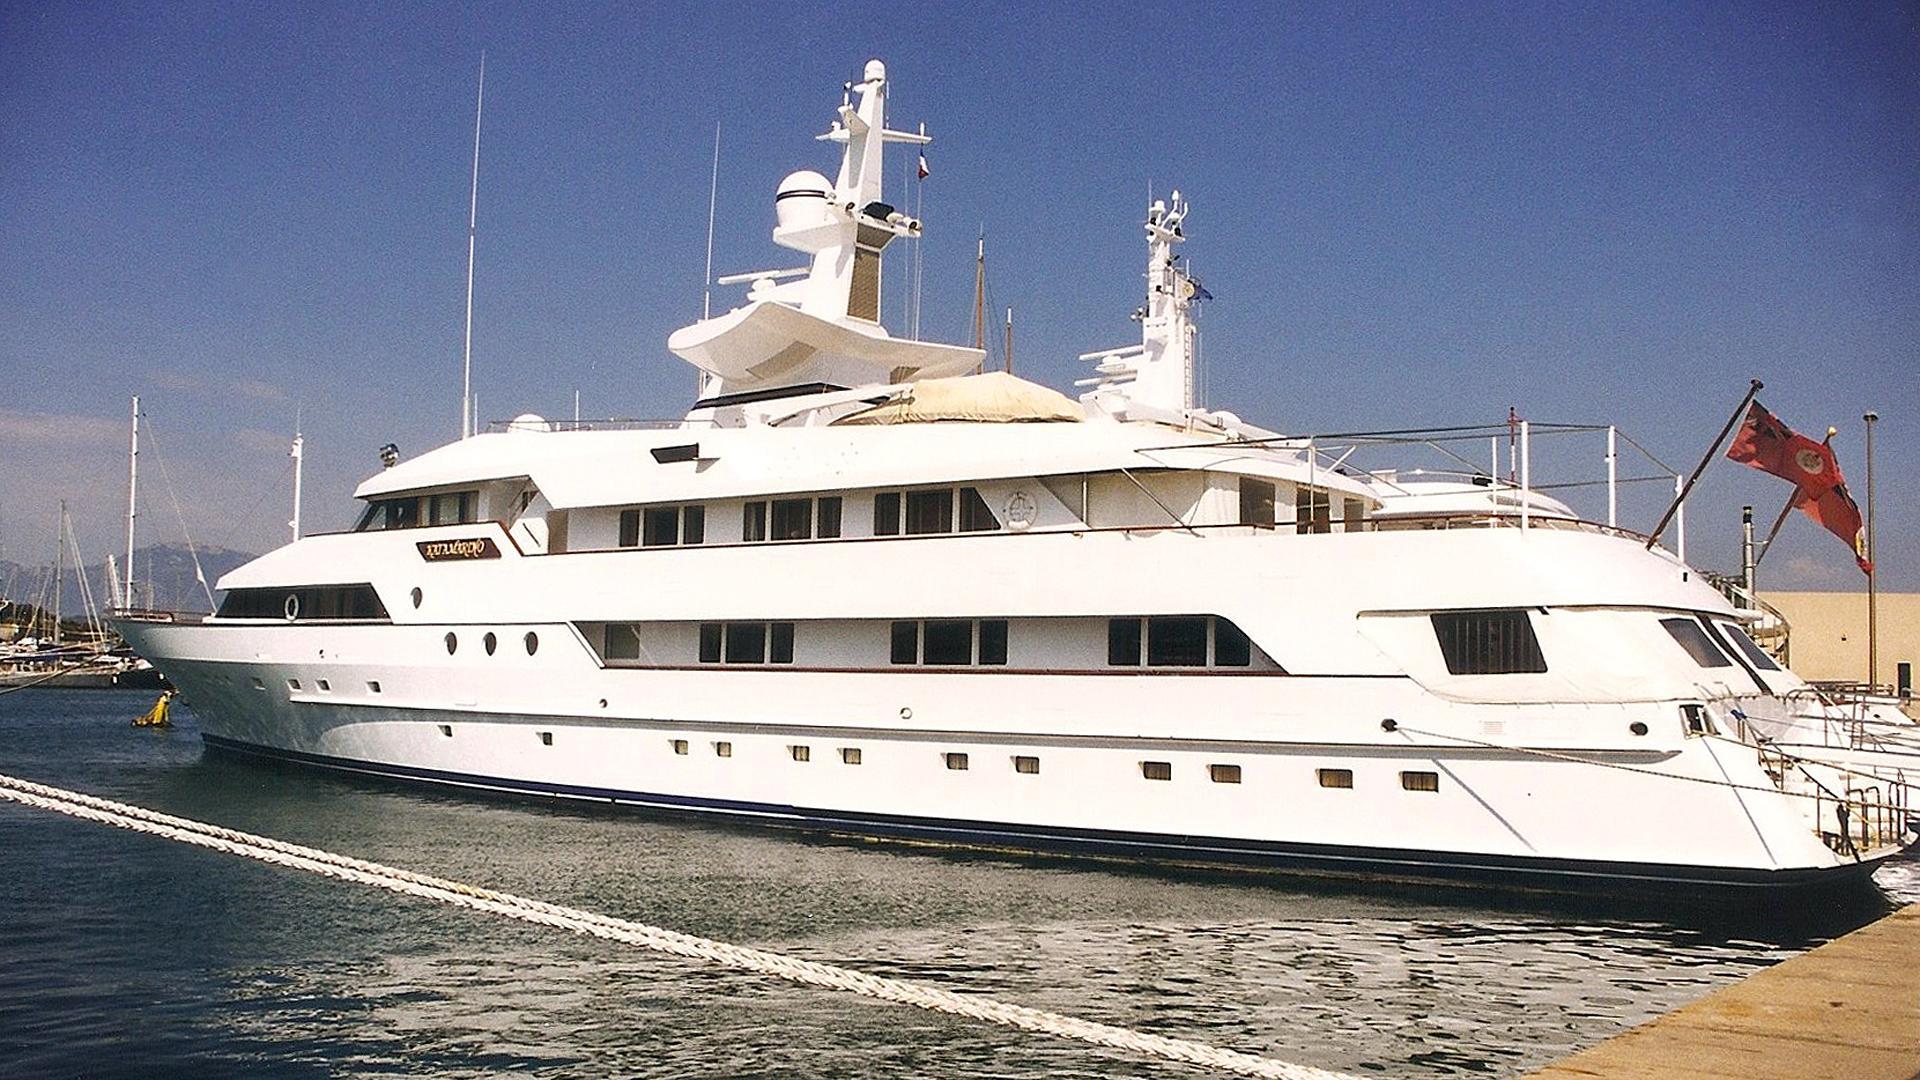 paris-i-motor-yacht-amels-1991-56m-profile